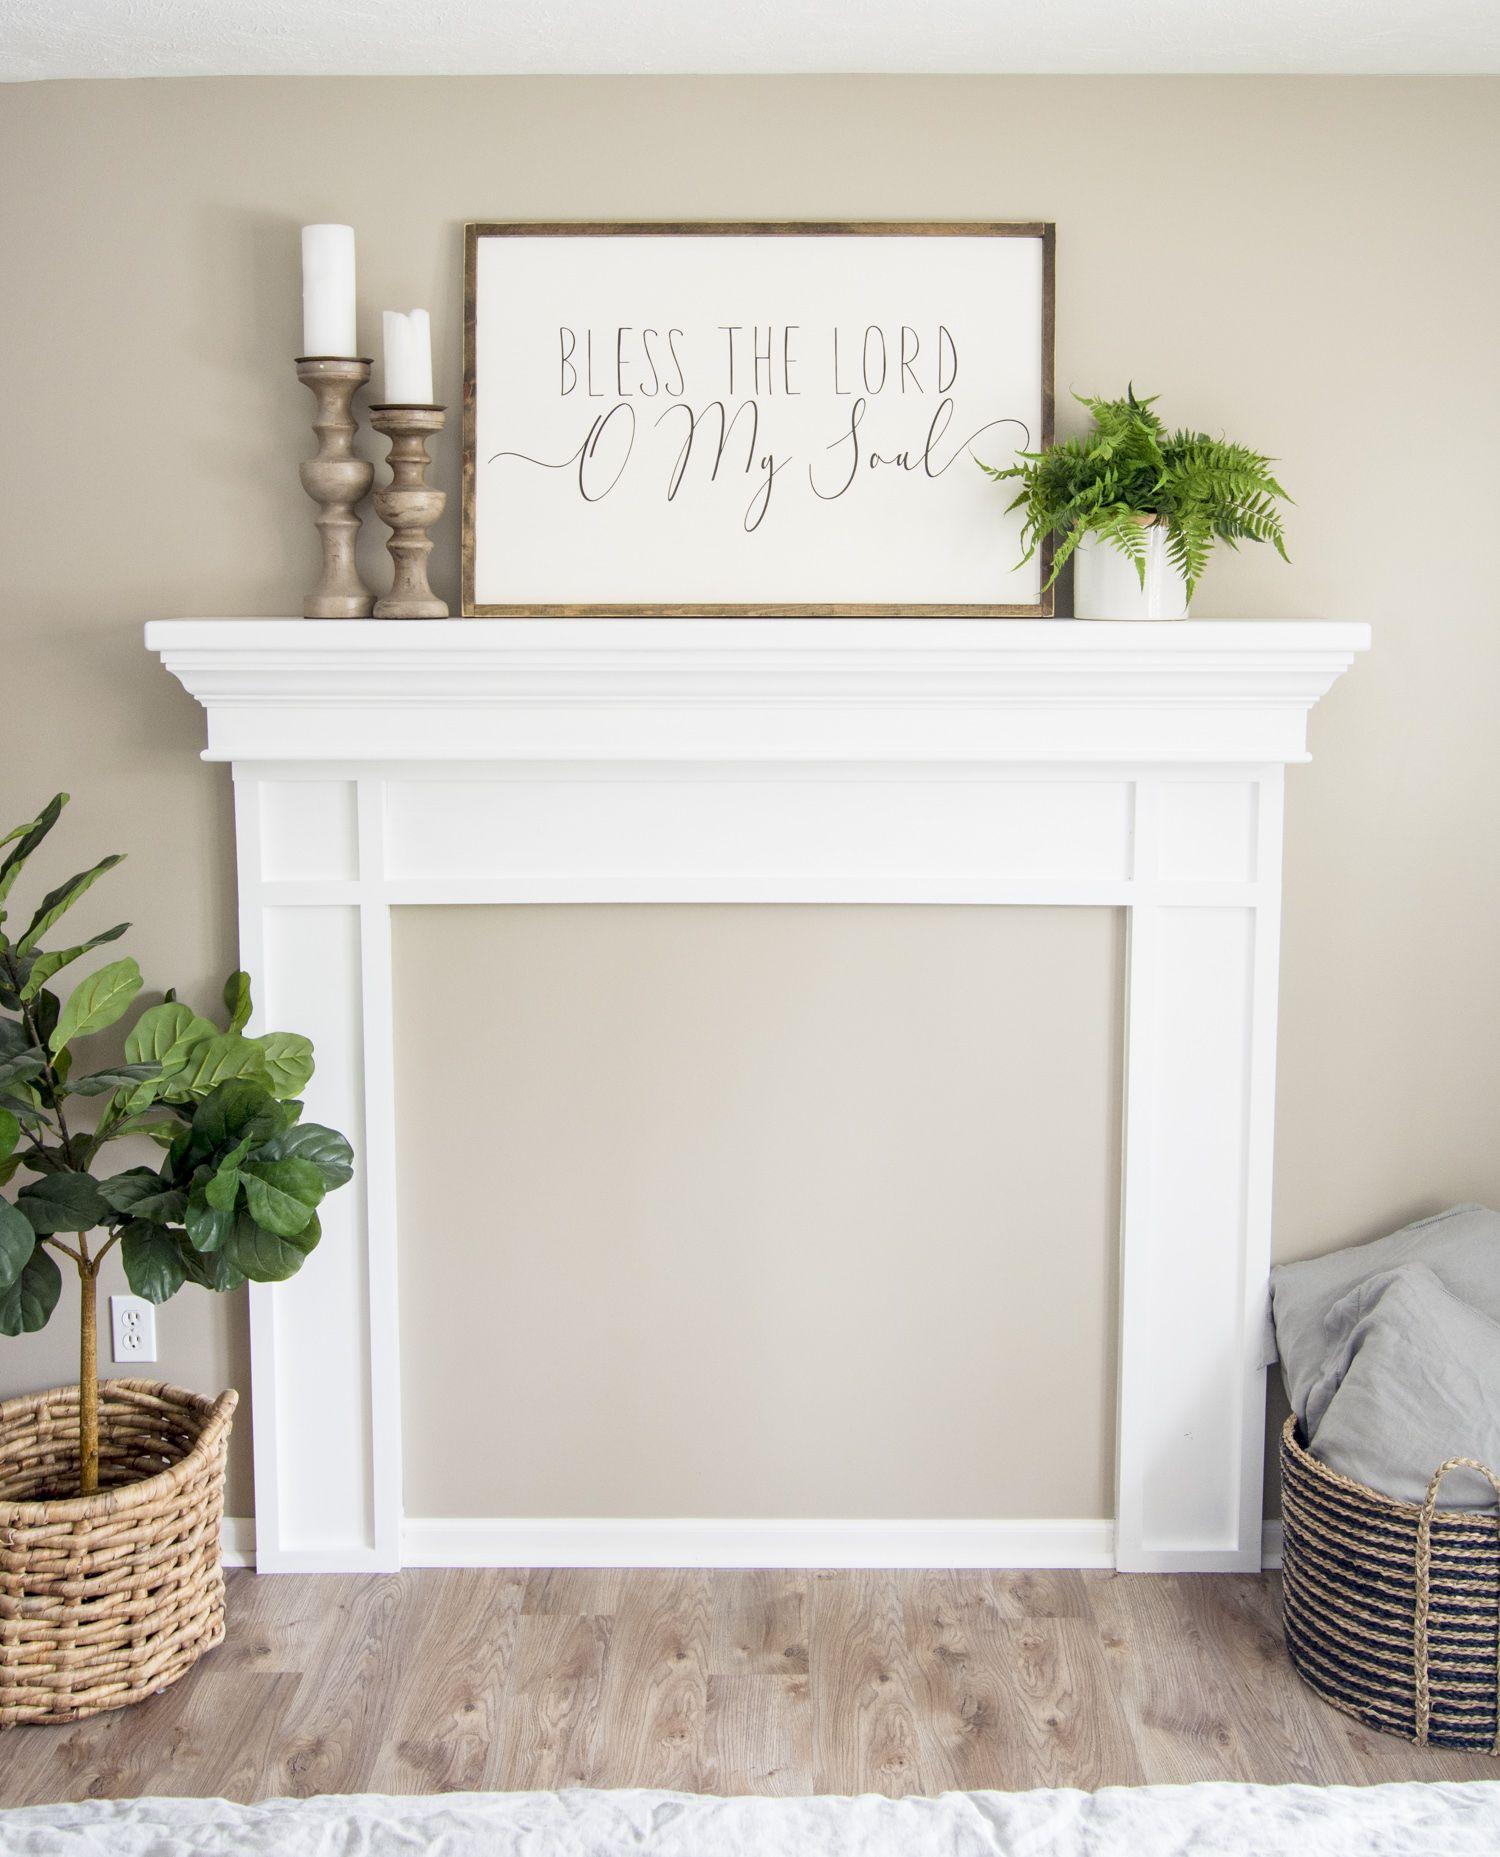 Diy faux fireplace mantel tutorial faux fireplace diy